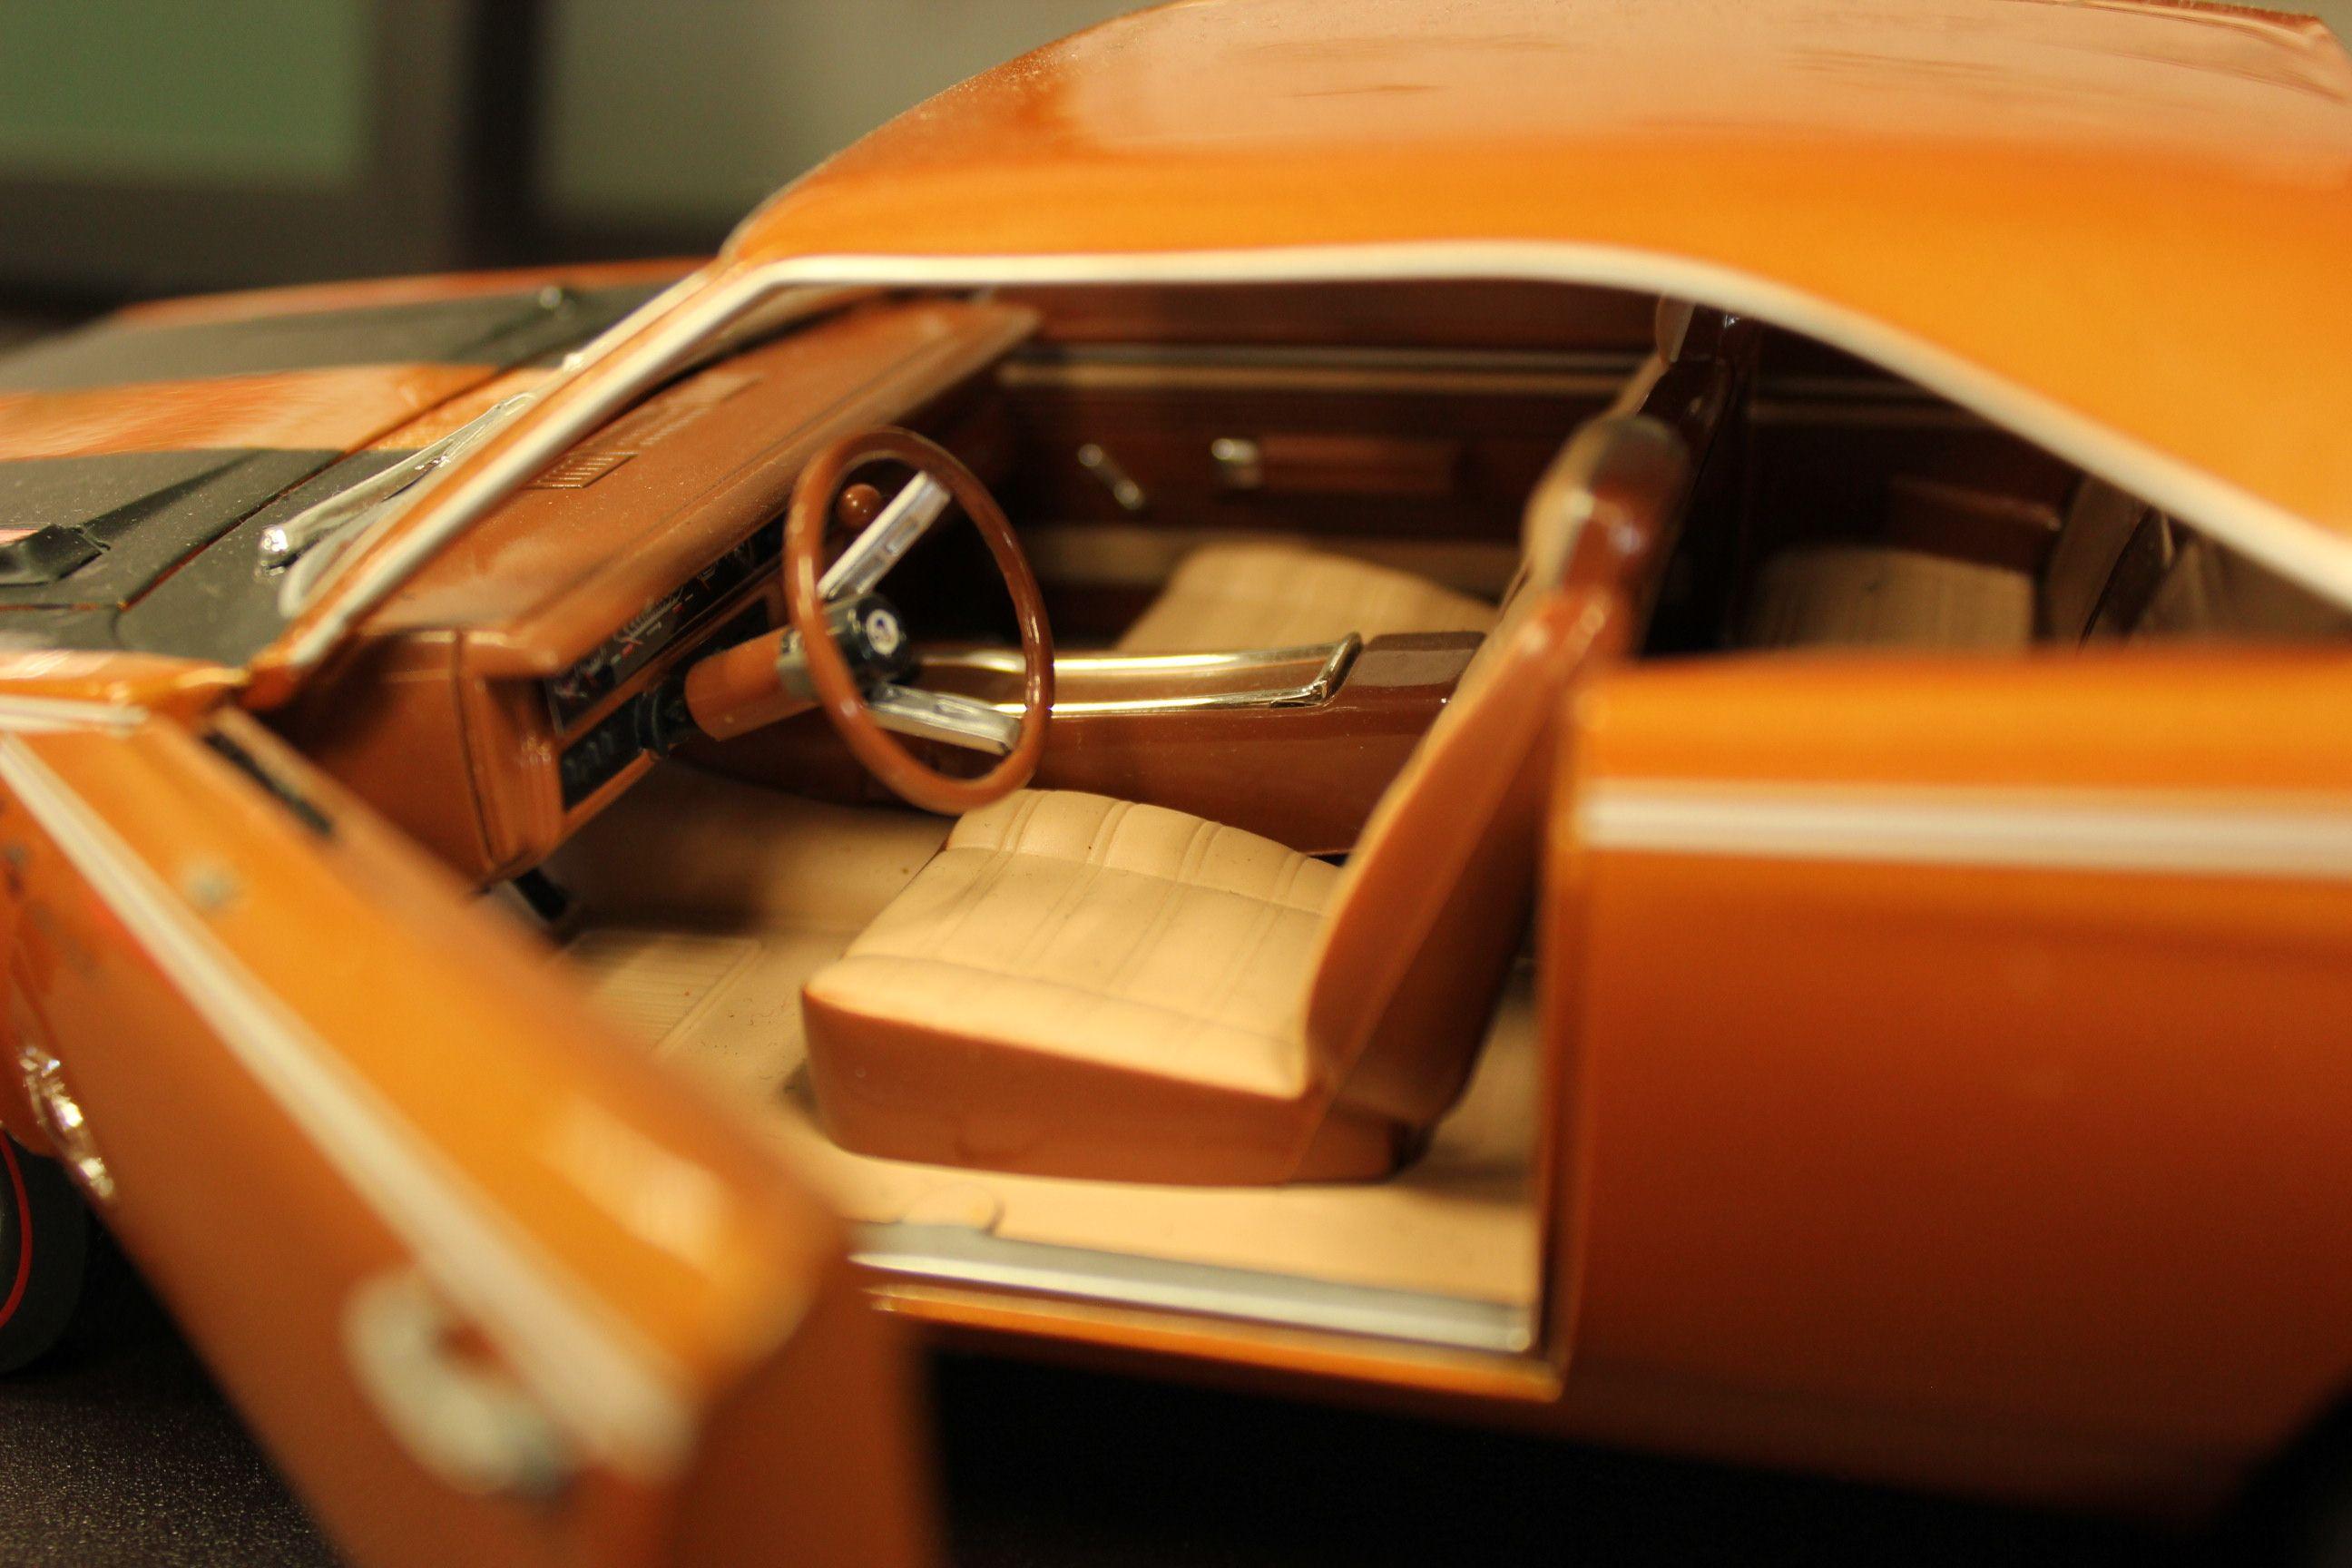 Car interior detailing - Model Car Interior Such Fine Detailing